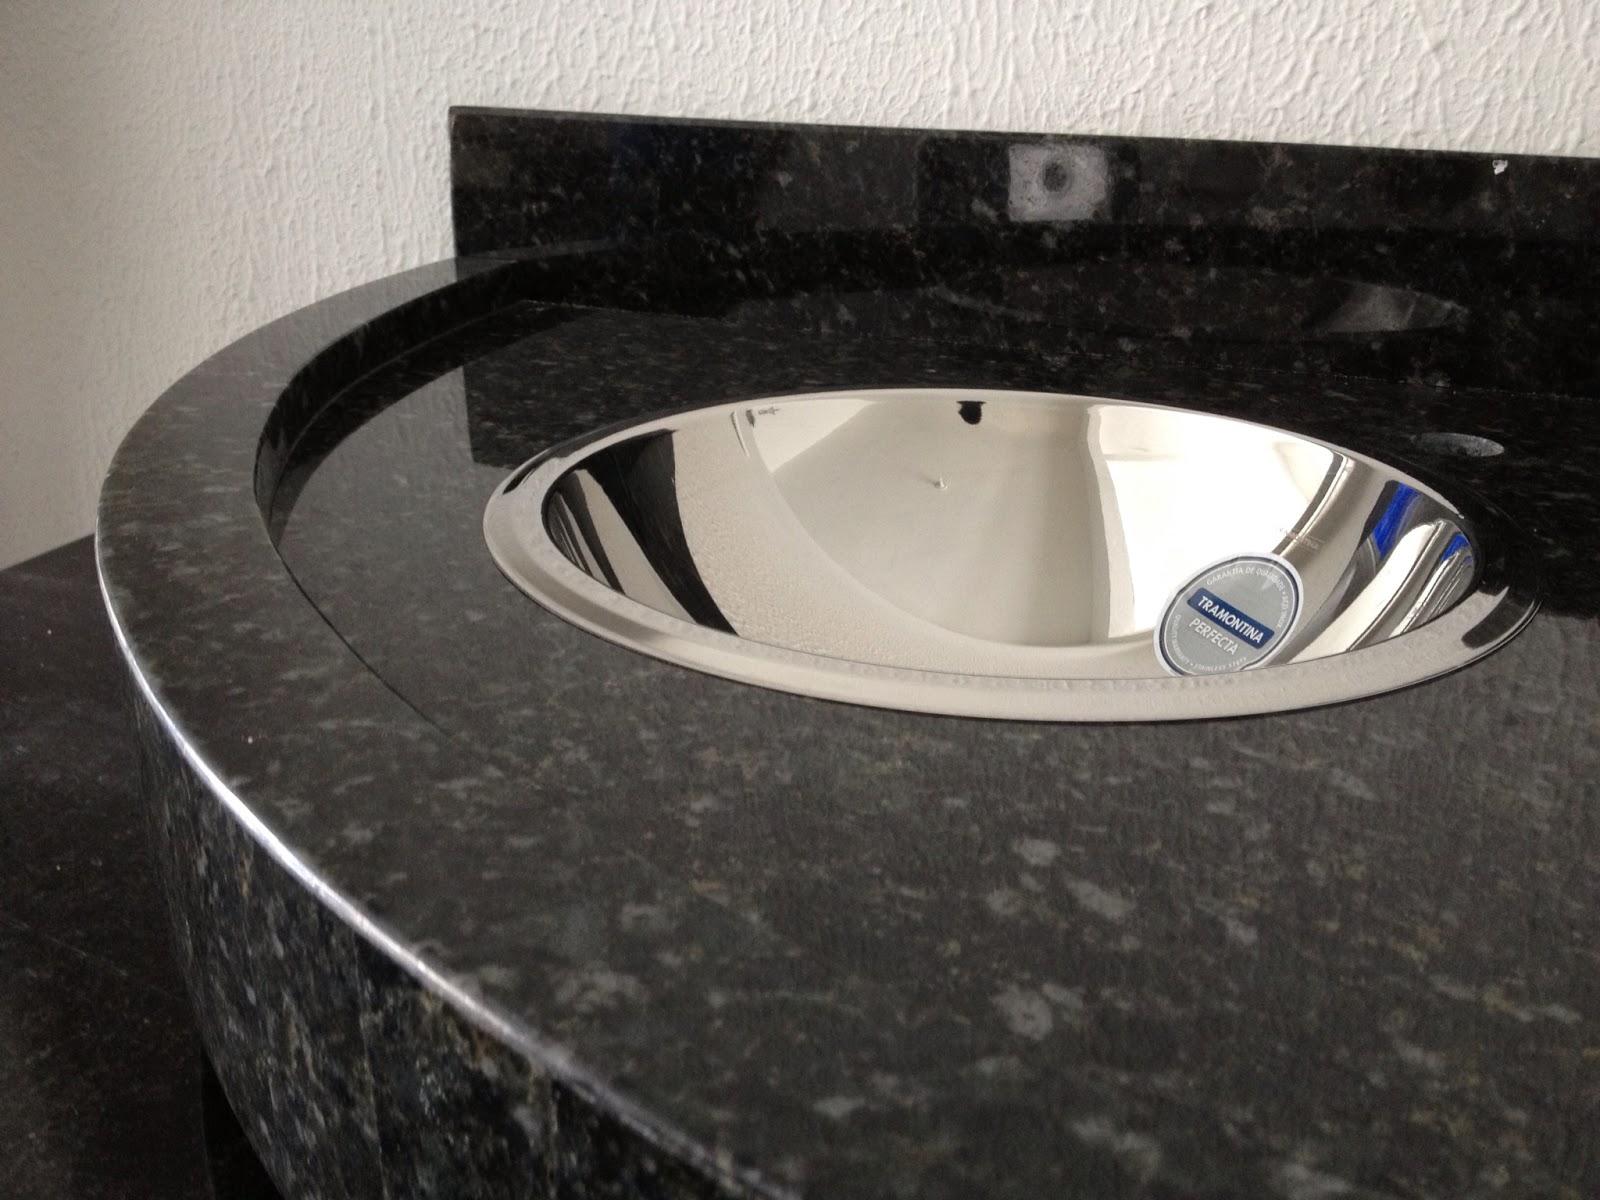 Ângulo Mármores e Granitos: Pia de Banheiro Verde Ubatuba #2F3D73 1600x1200 Bancada Banheiro Granito Verde Ubatuba